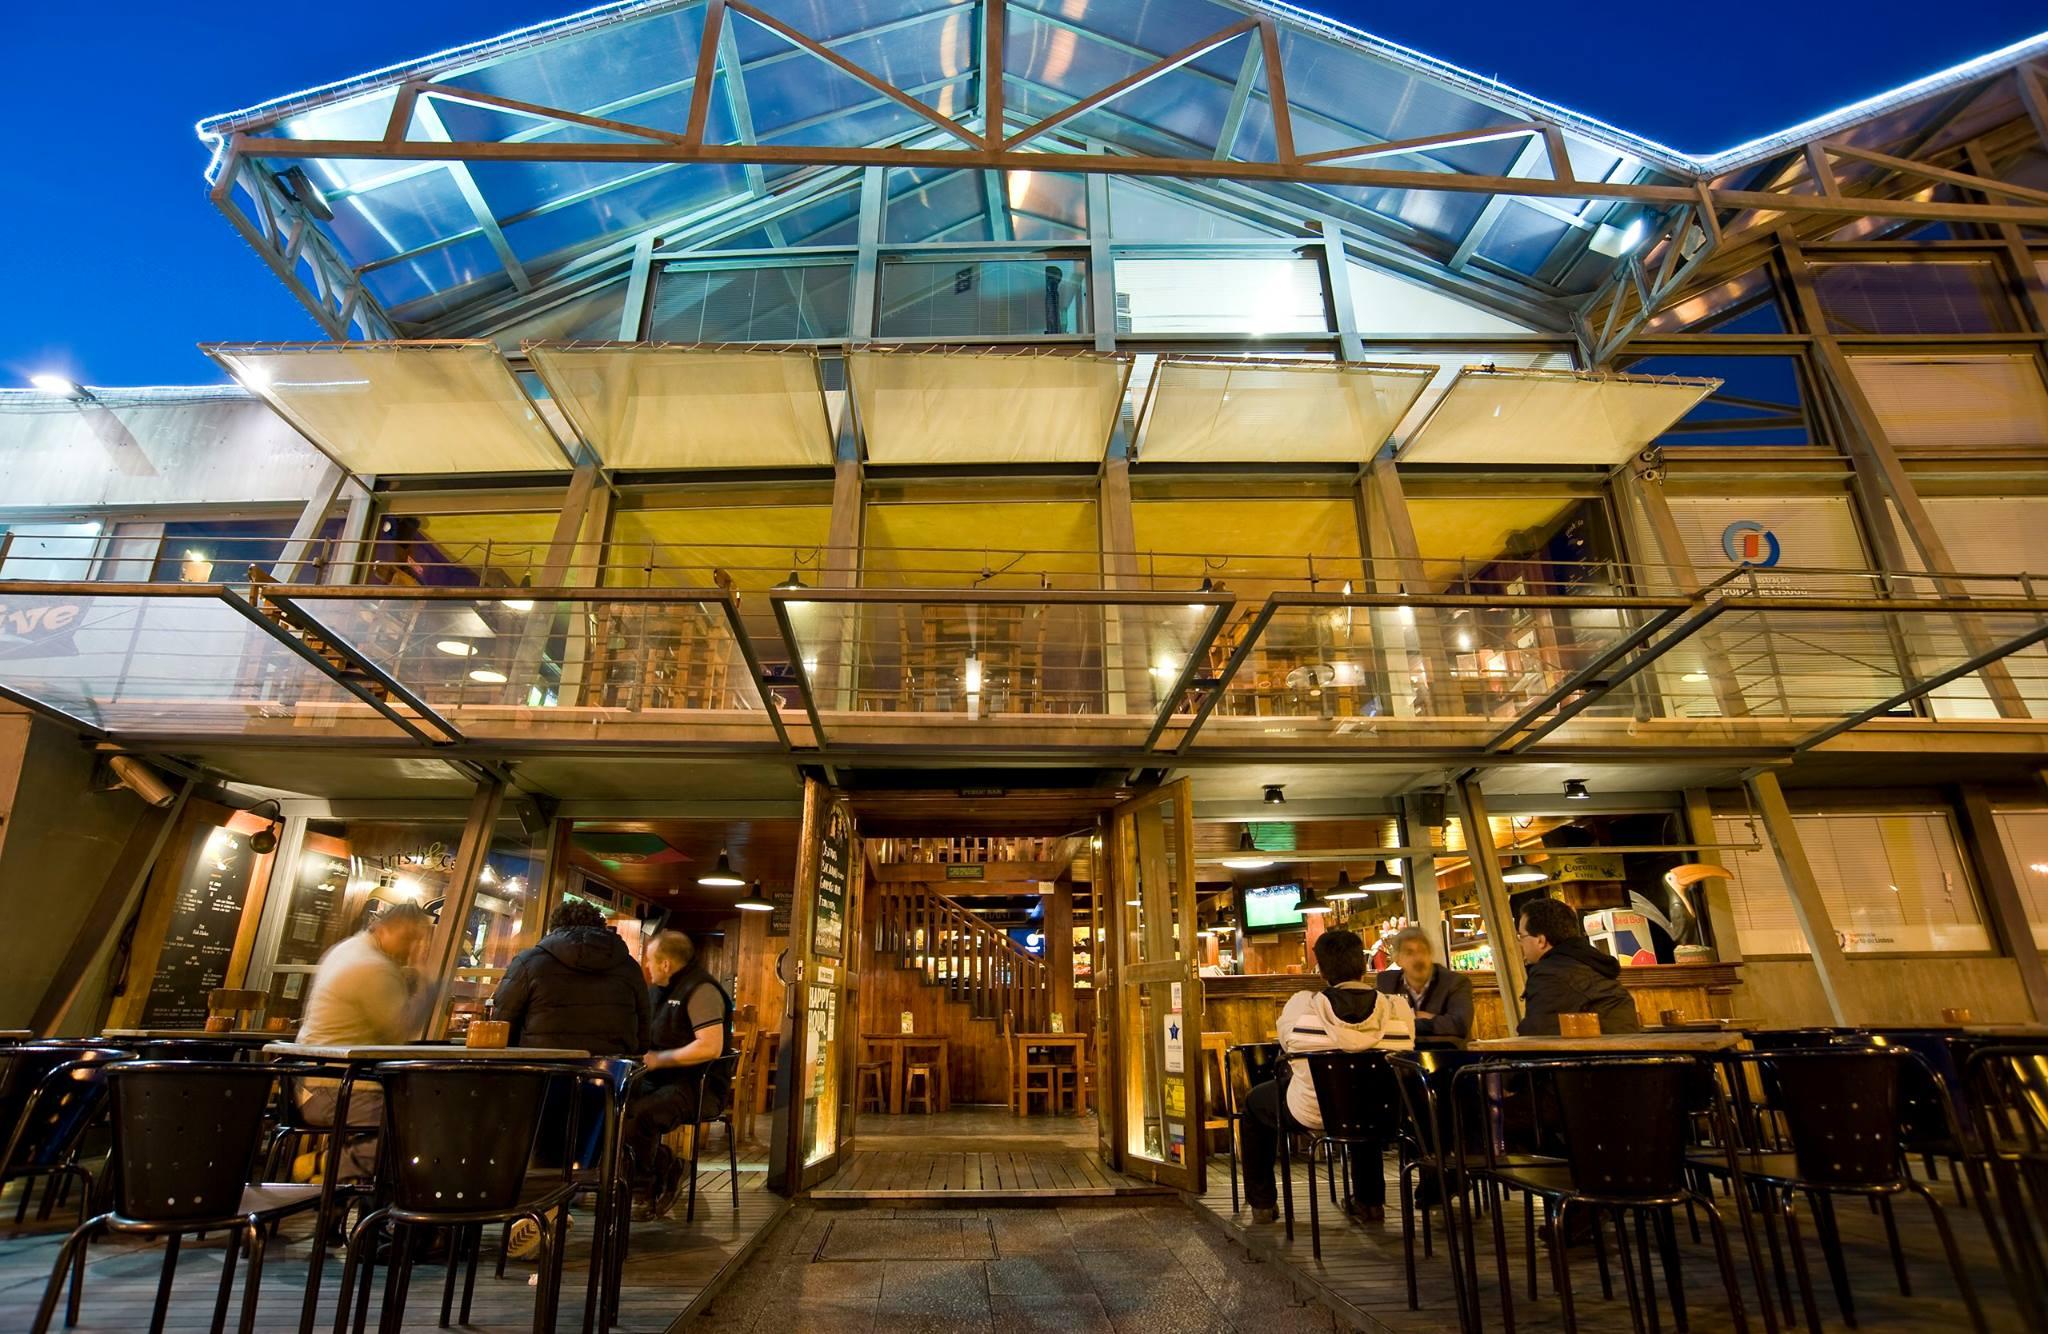 Irish Co - Sports Bar irlandais - Docks Alcantara - Lisbonne